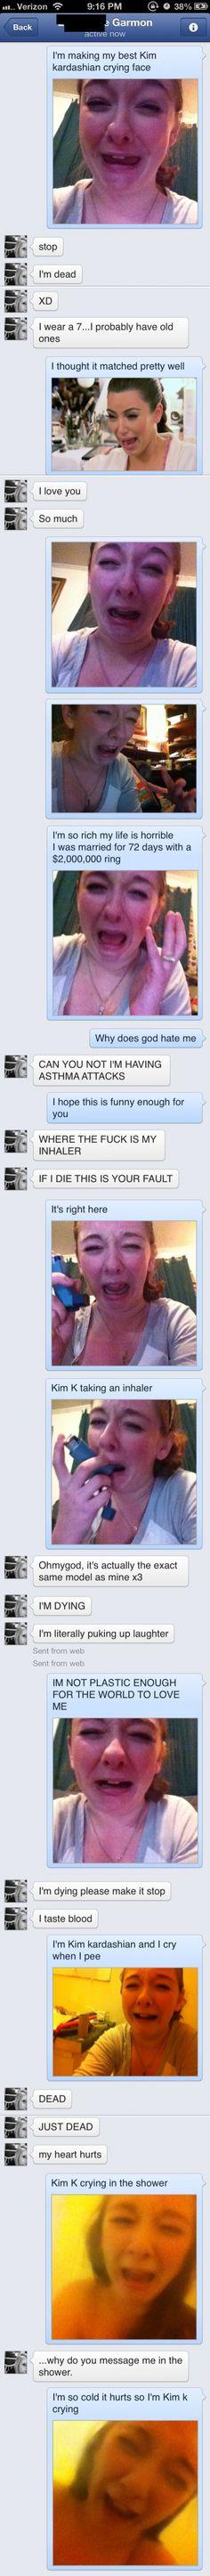 Kim K crying face... bahahahaha. Too funny! this is spot on